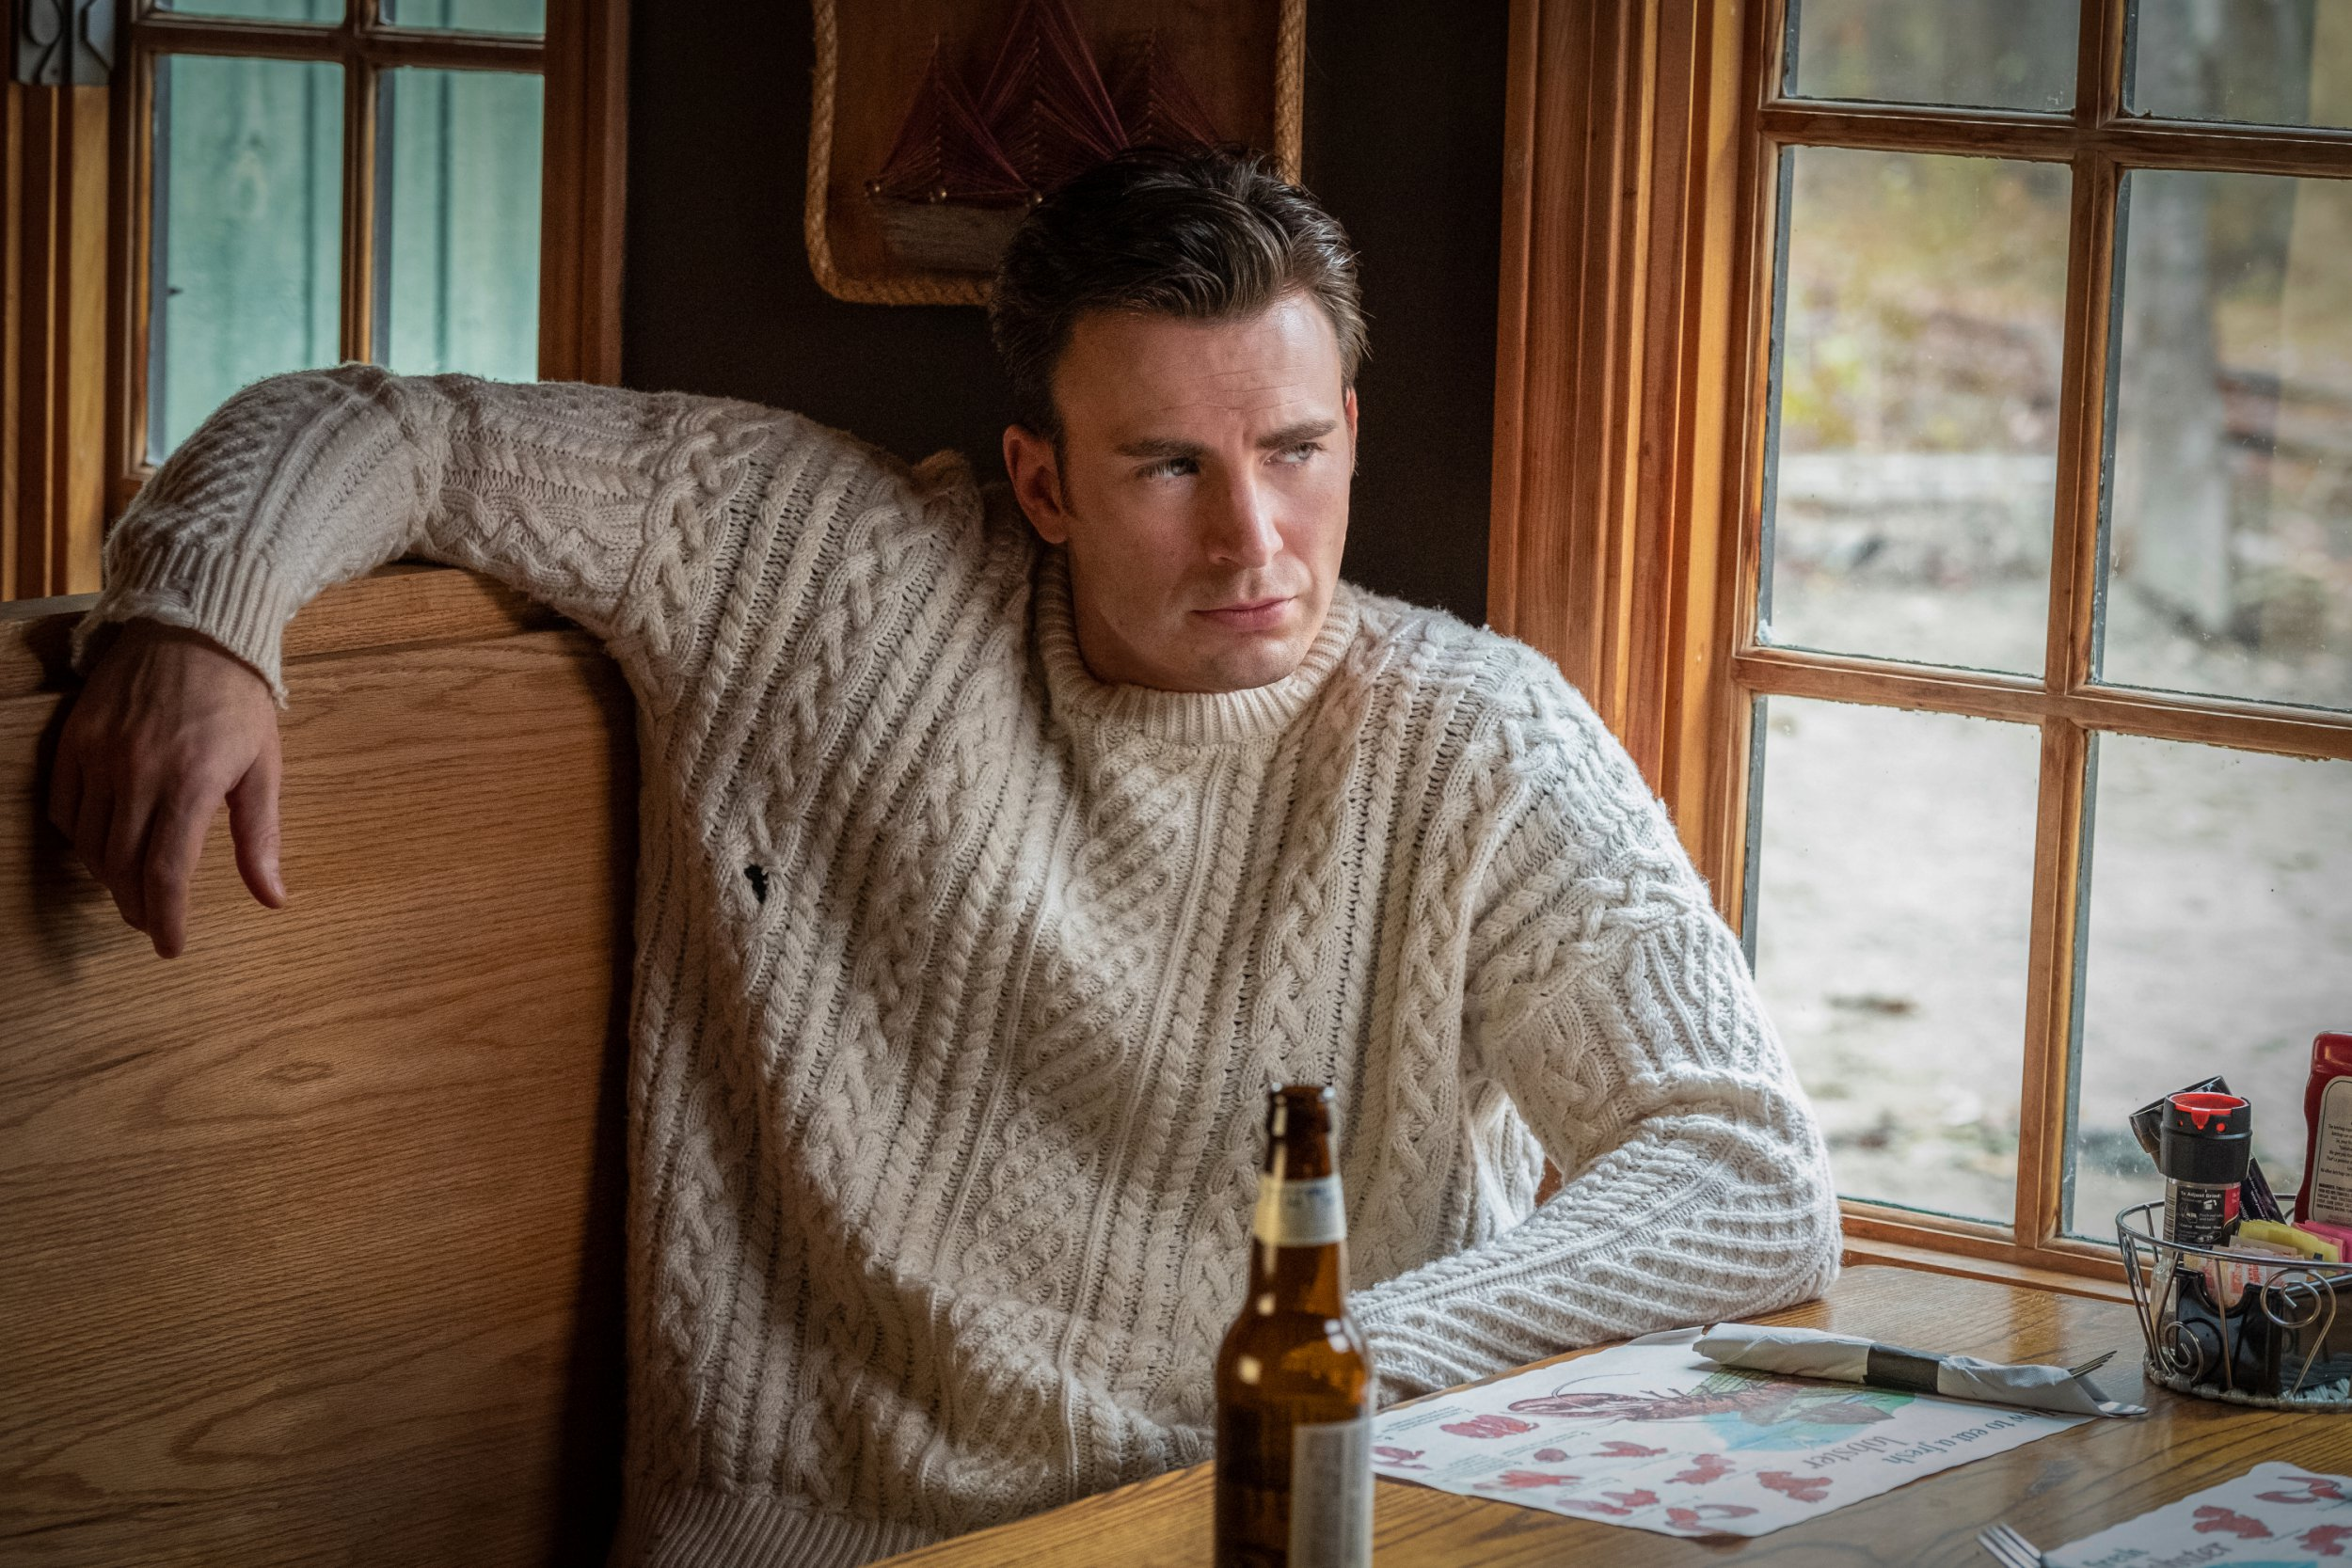 Man orders \u0027affordable\u0027 jumper but gets wool he has to knit